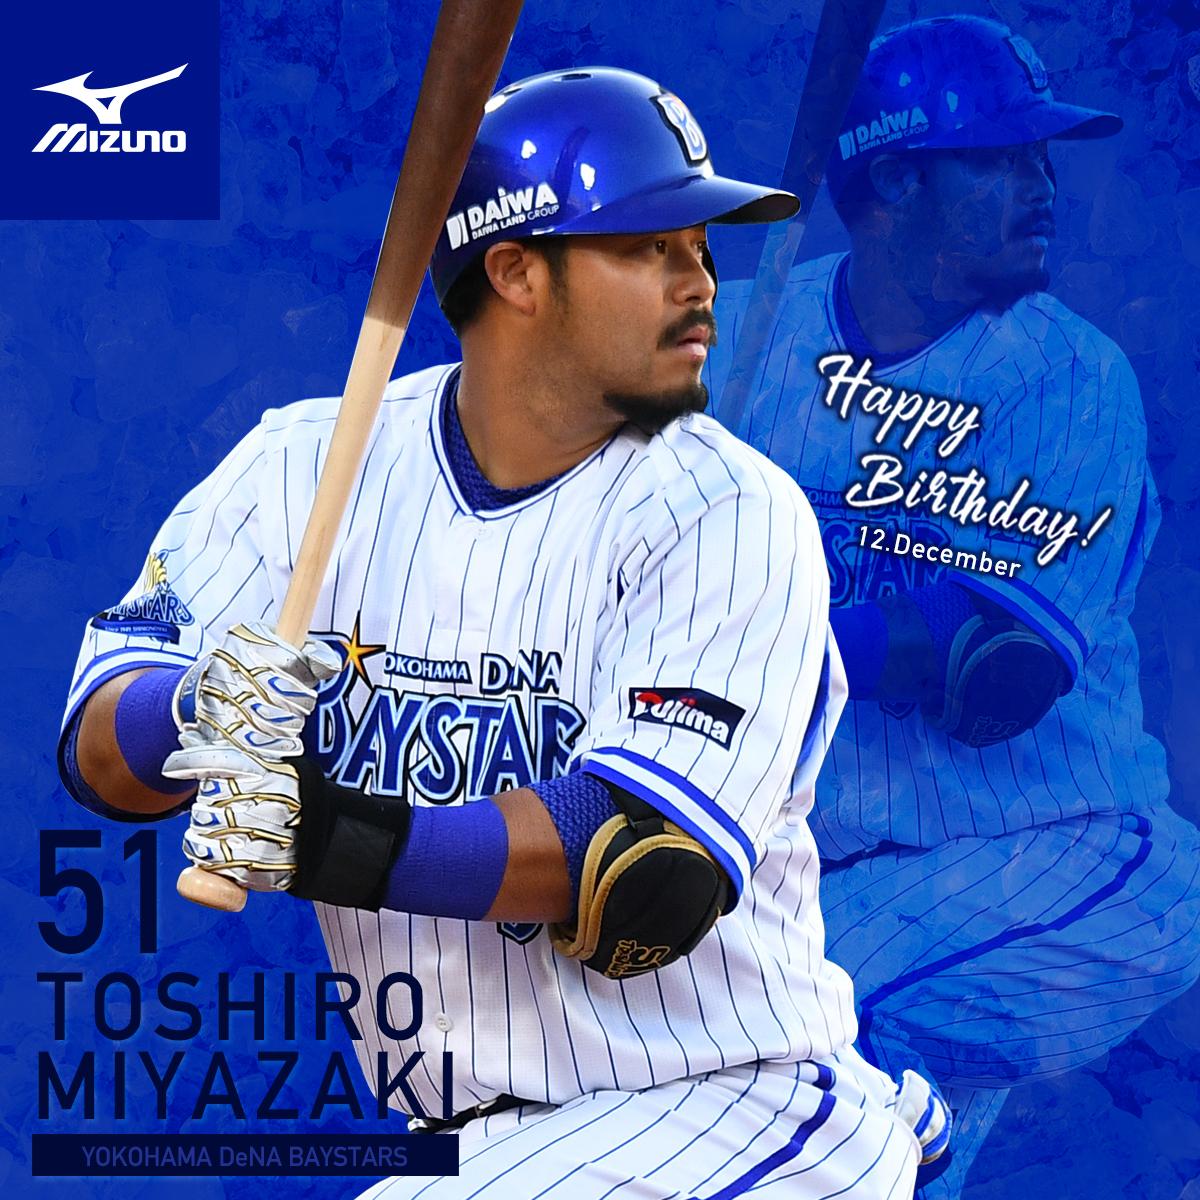 test ツイッターメディア - \お誕生日おめでとうございます!/  2019.12.12 ⠀⠀⠀⠀⠀⠀⠀⠀⠀ Happy birthday to Toshiro Miyazaki. #宮﨑敏郎 #横浜DeNAベイスターズ #baystars  #ミズノ #ミズノブランドアンバサダー #誕生日 https://t.co/p1qYJaT0uj